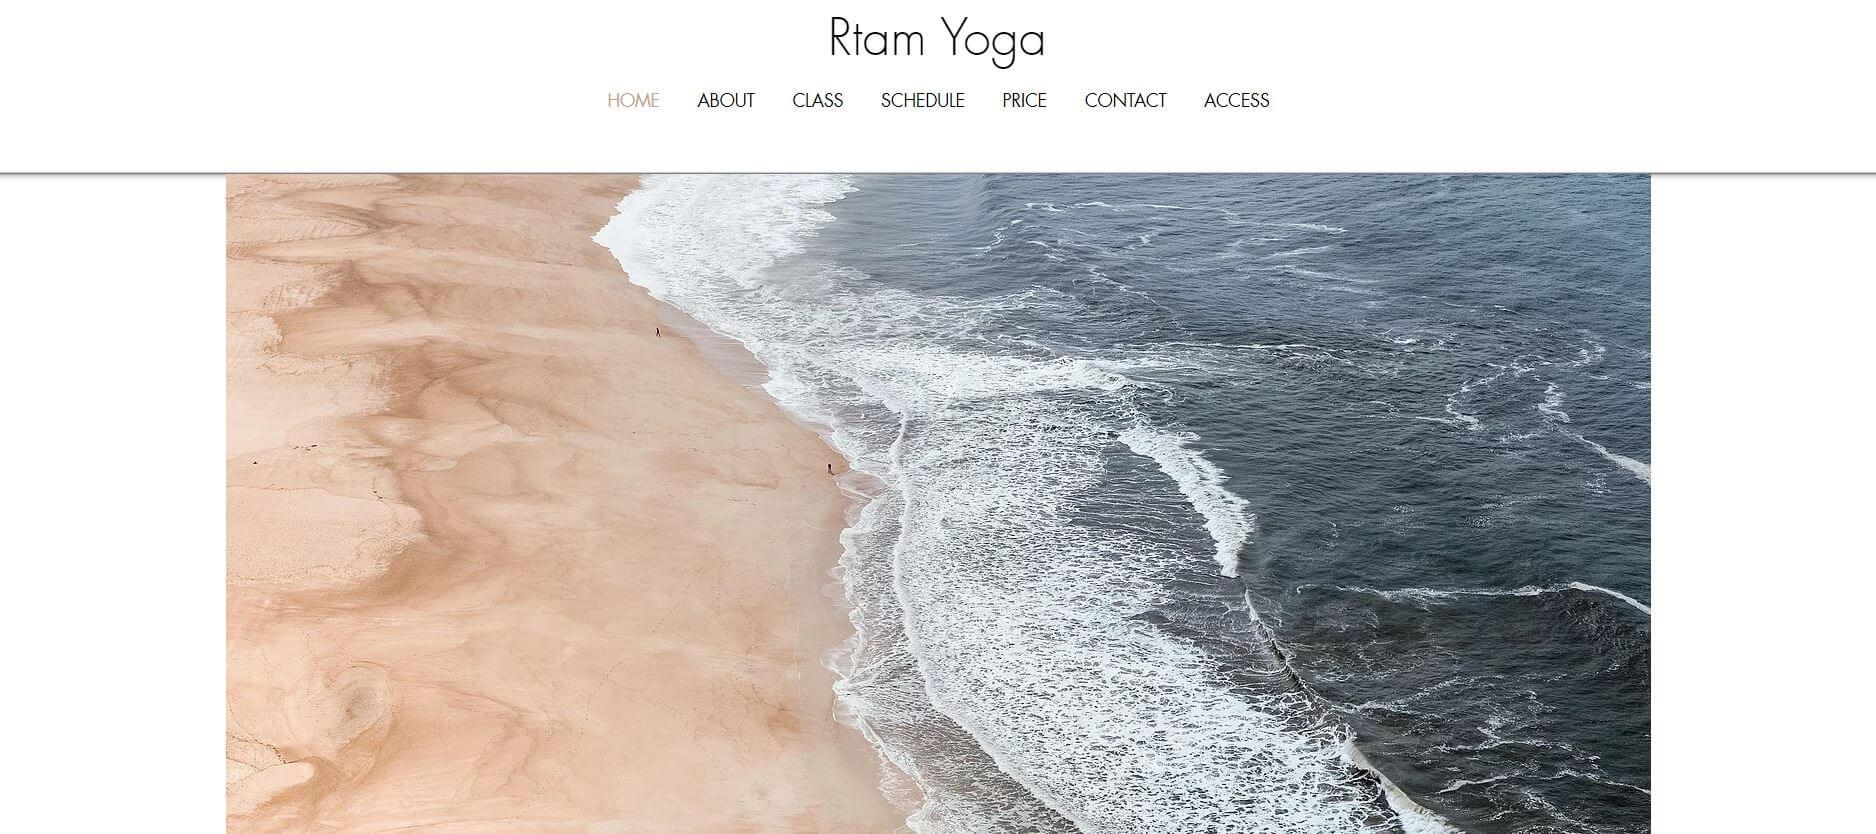 Rtam Yoga